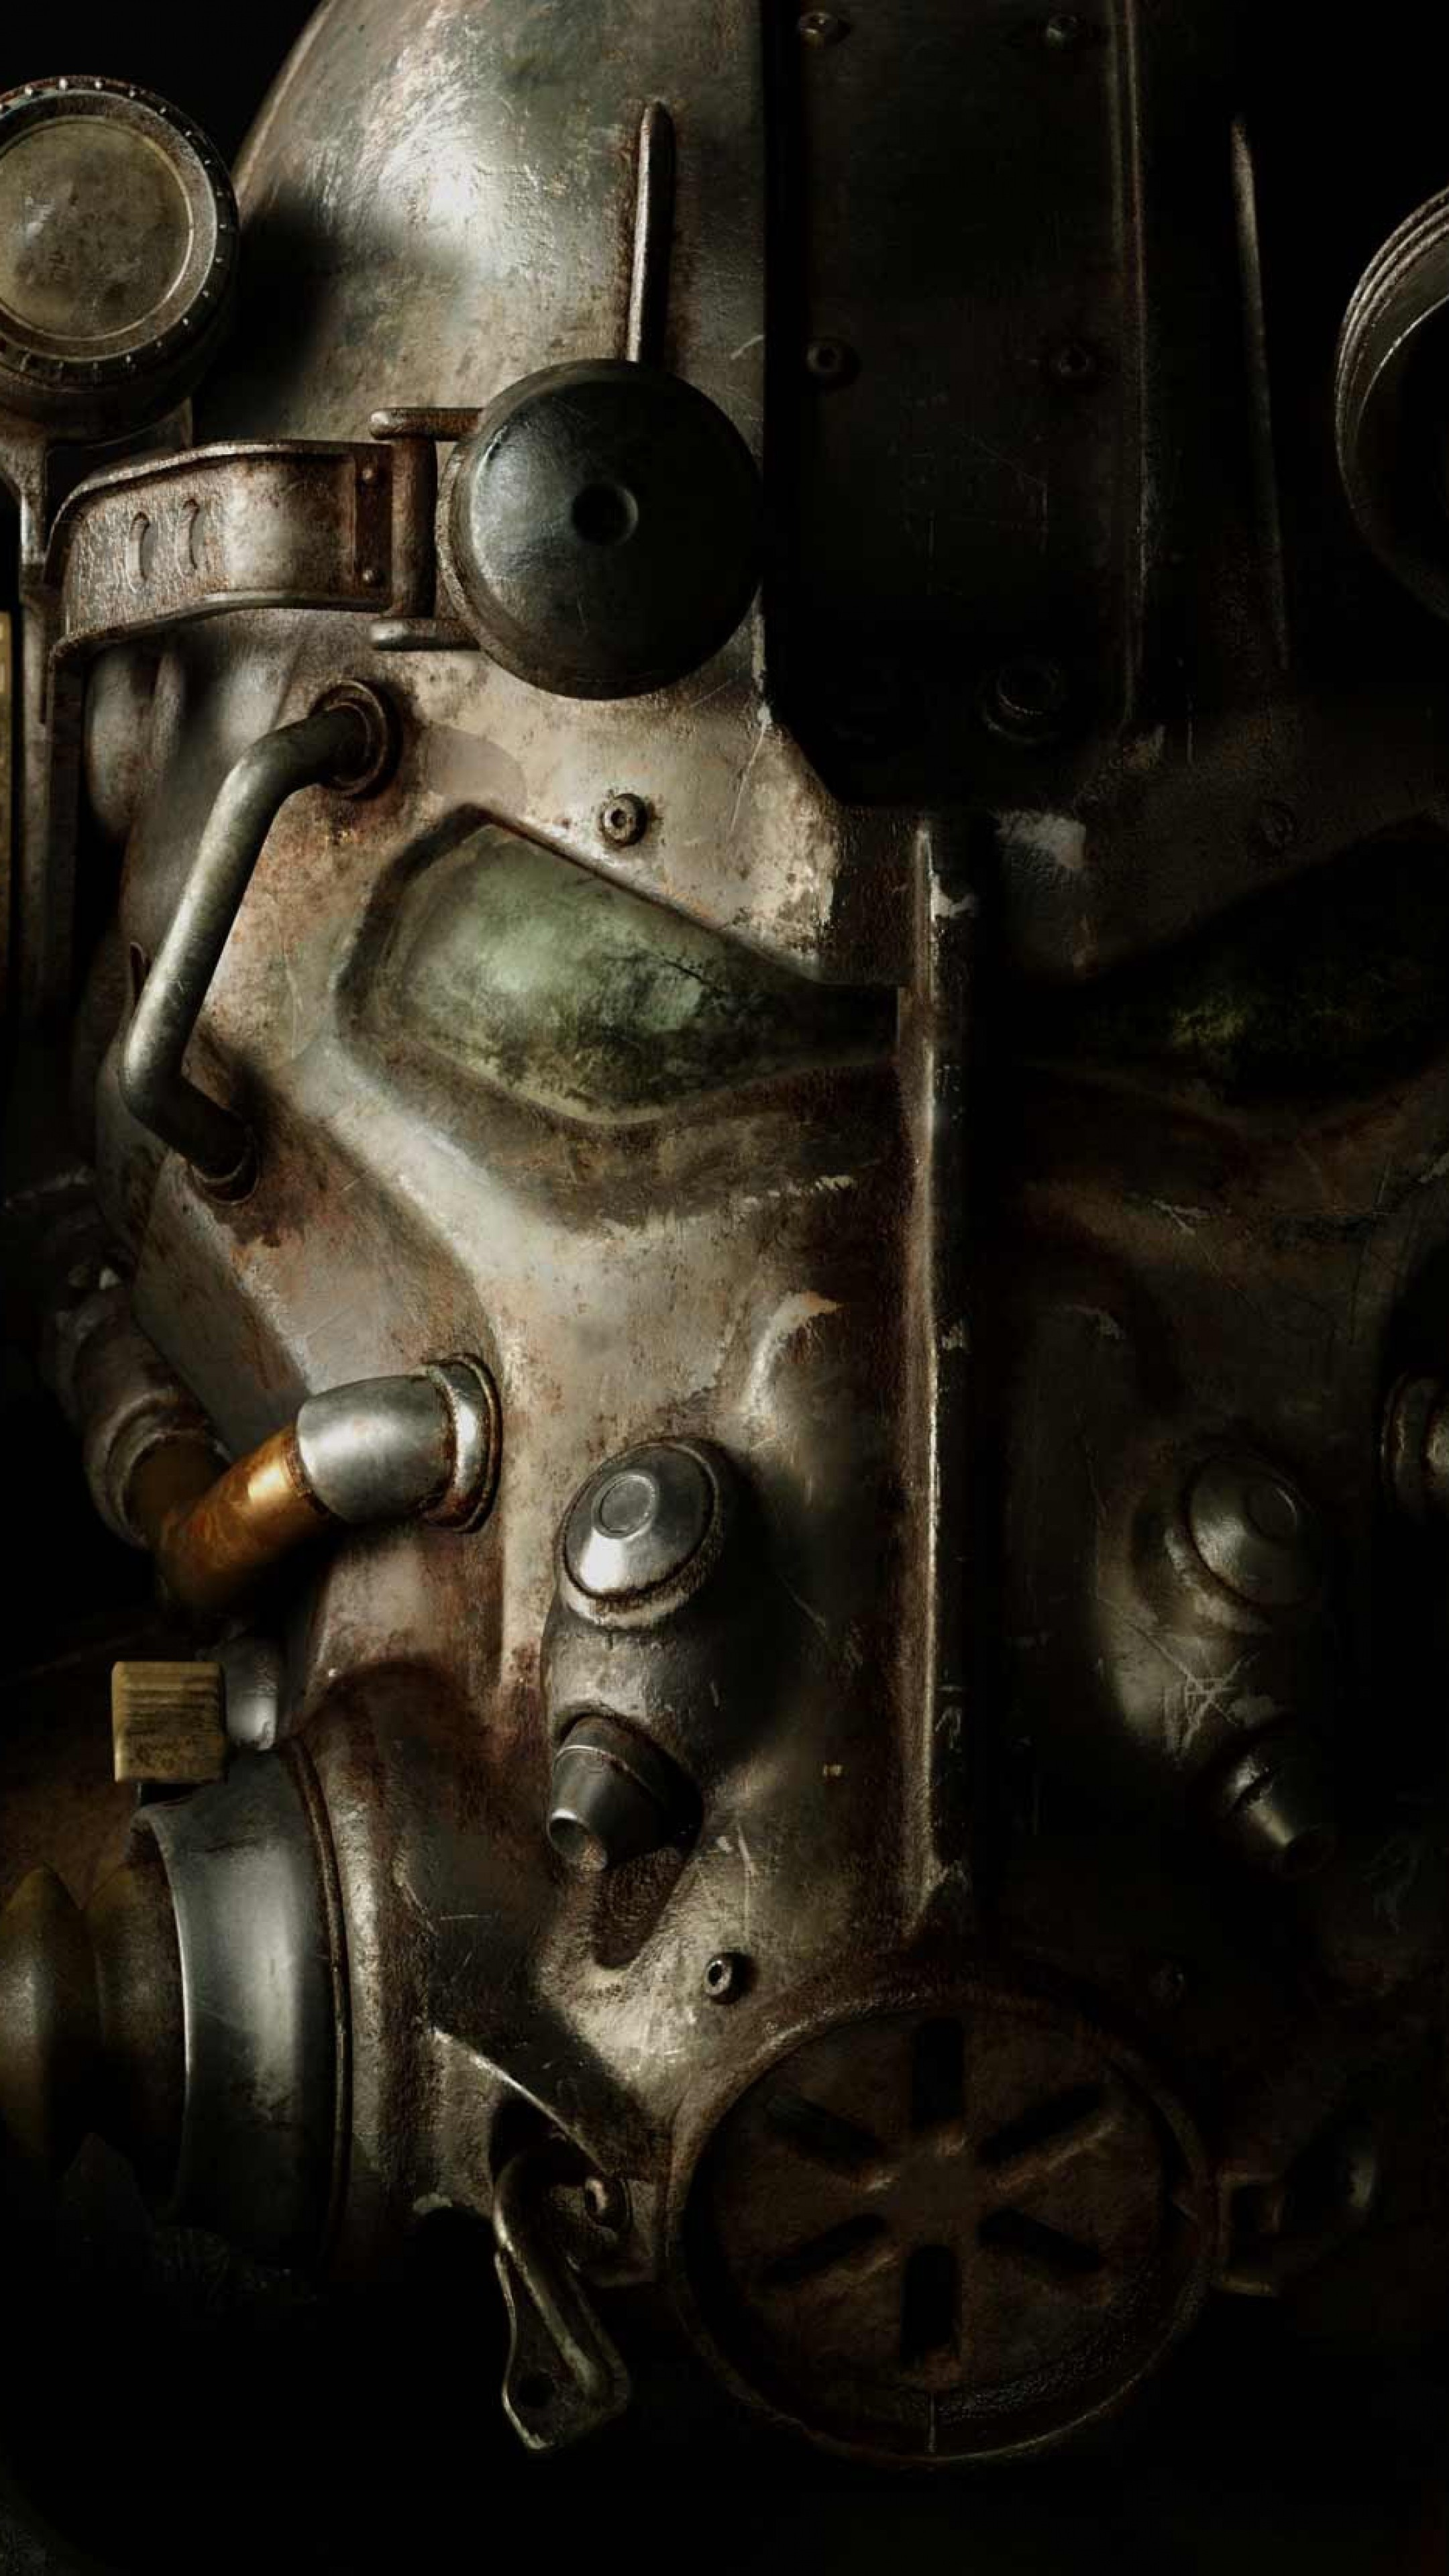 Wallpaper fallout 4, paladin, armor, helmet